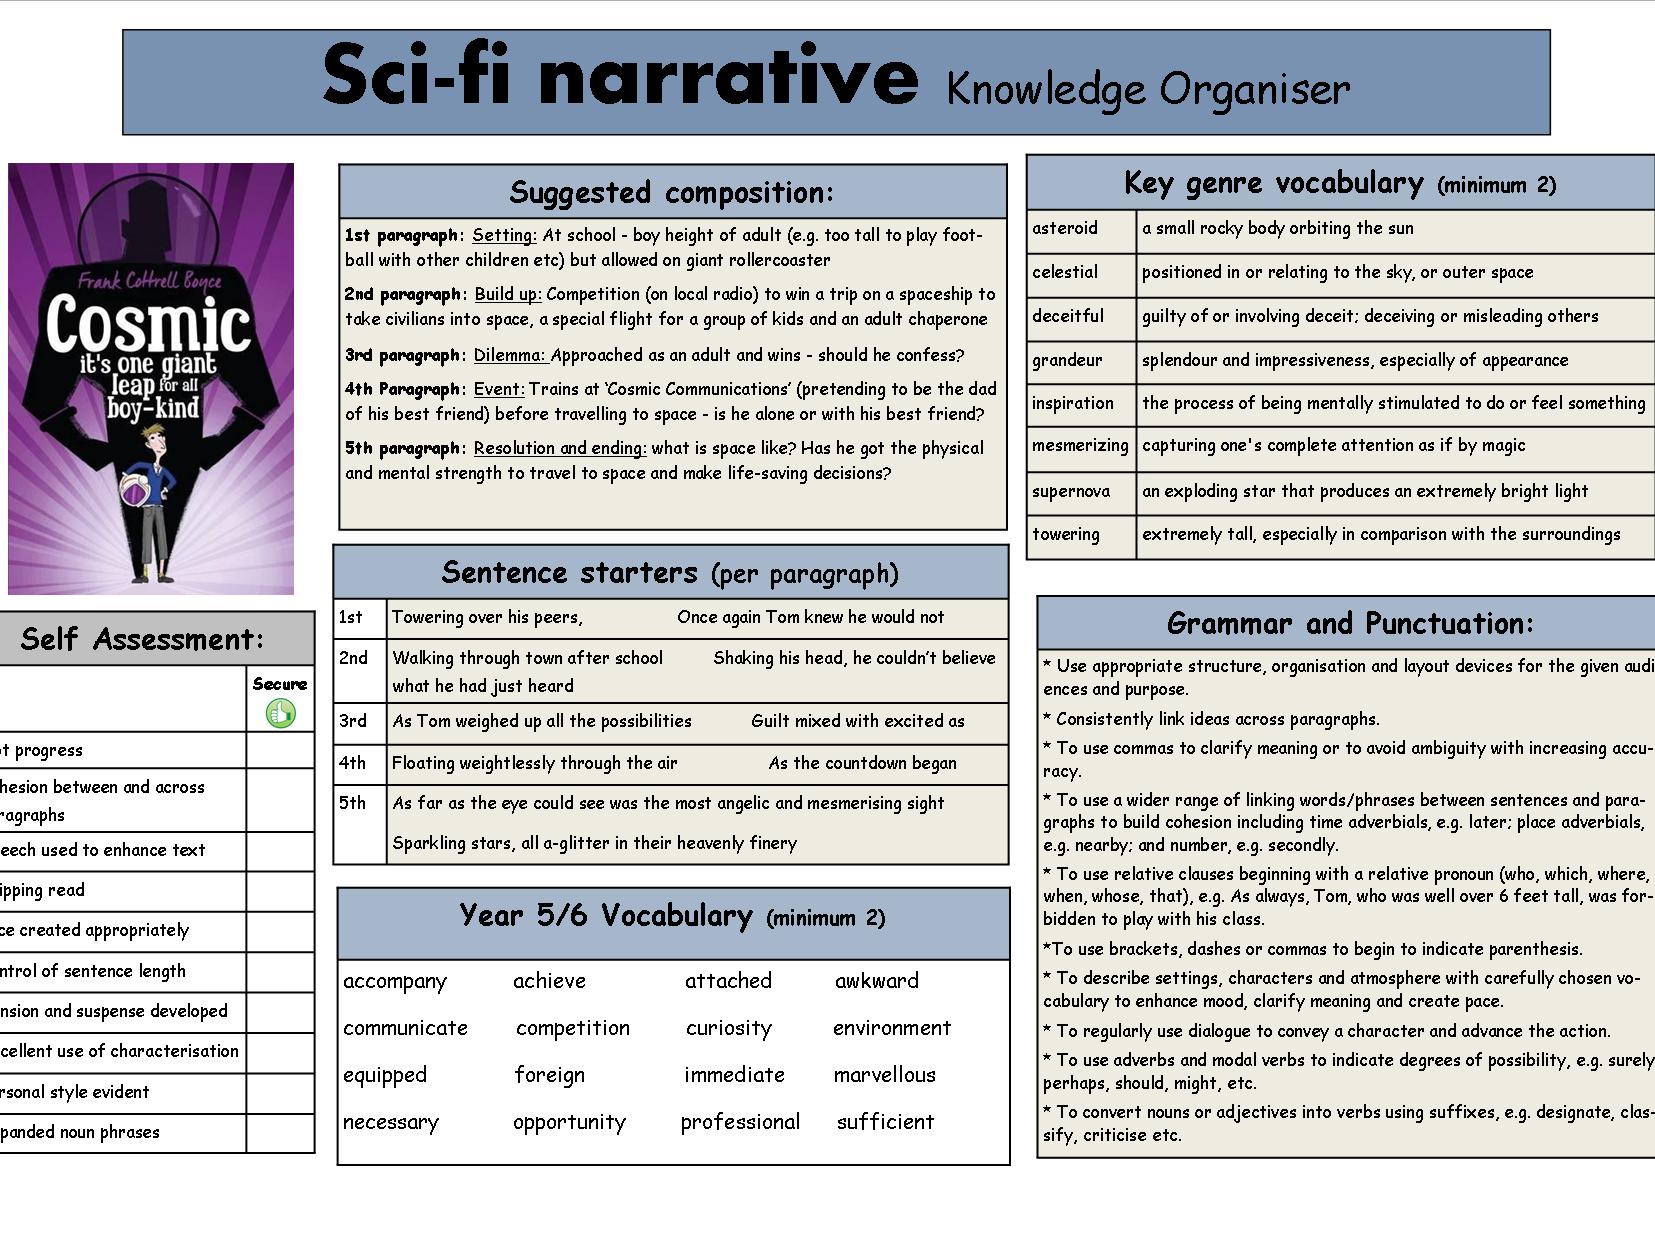 Sci-fi narrative knowledge organiser based on 'Cosmic'